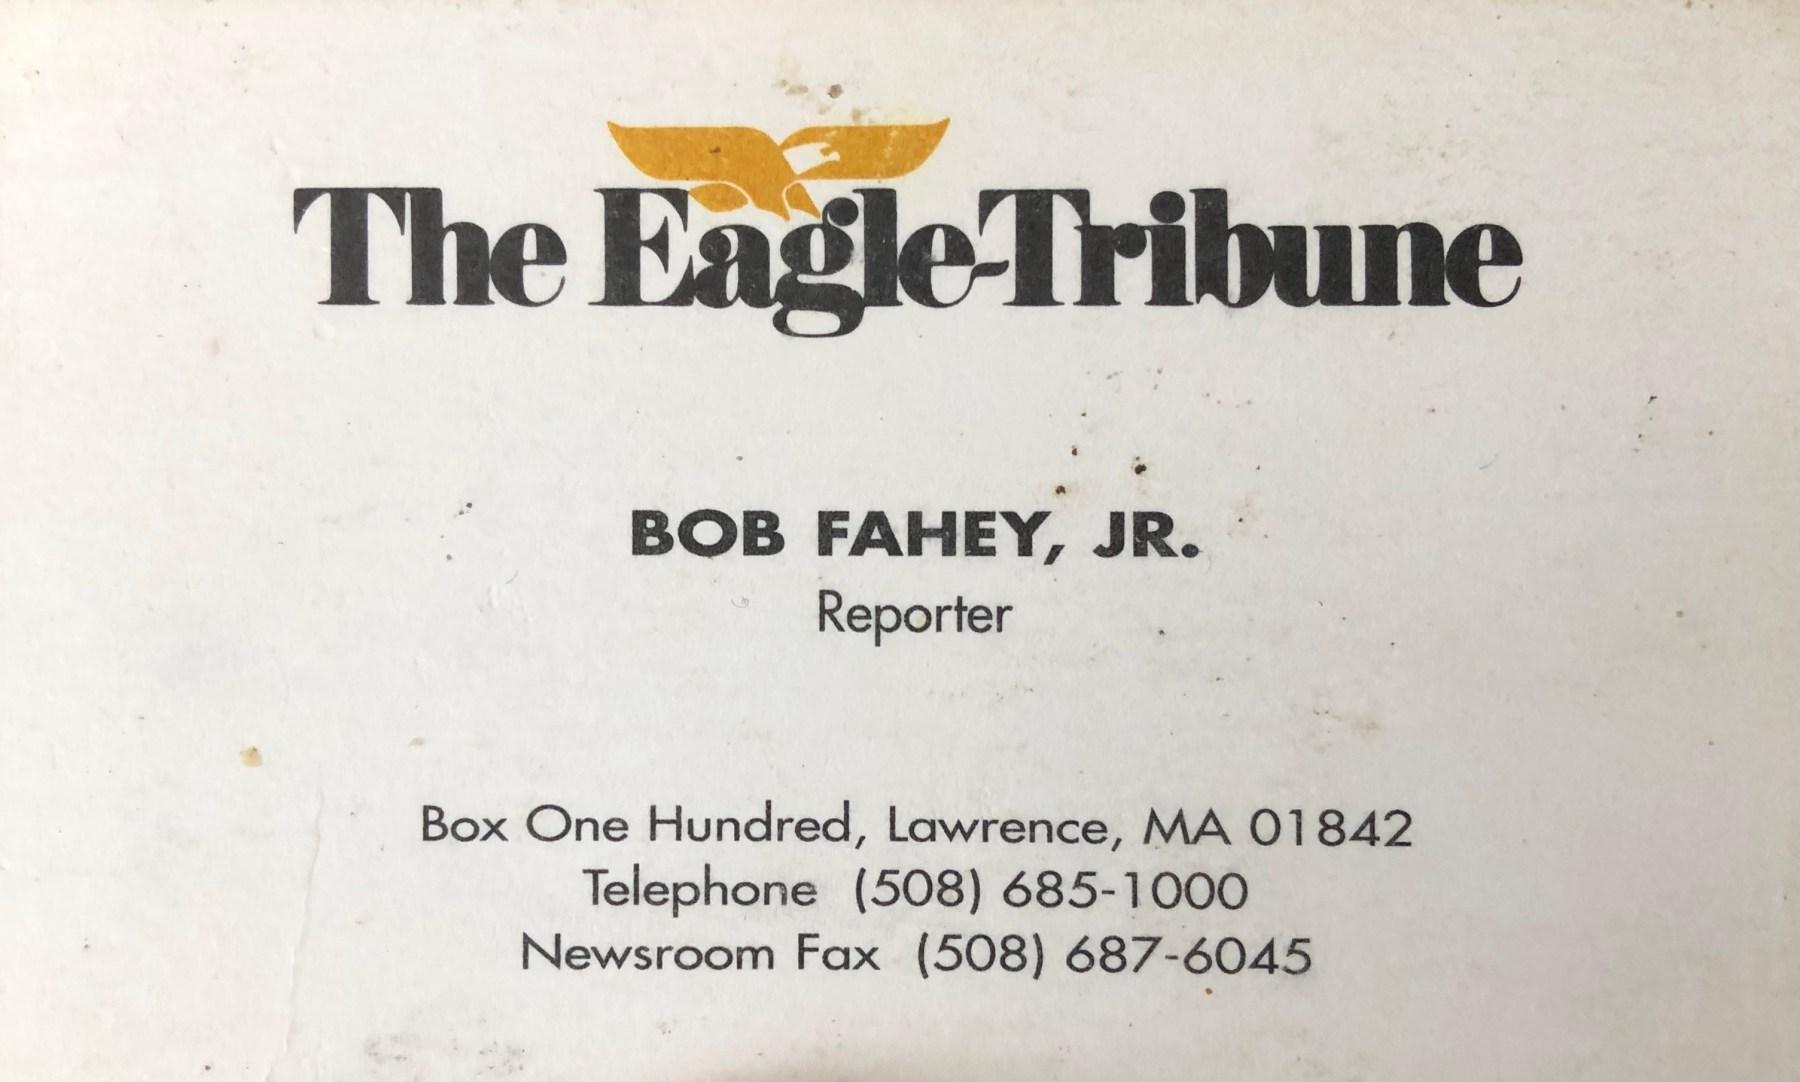 Robert Fahey Eagle-Tribune business card